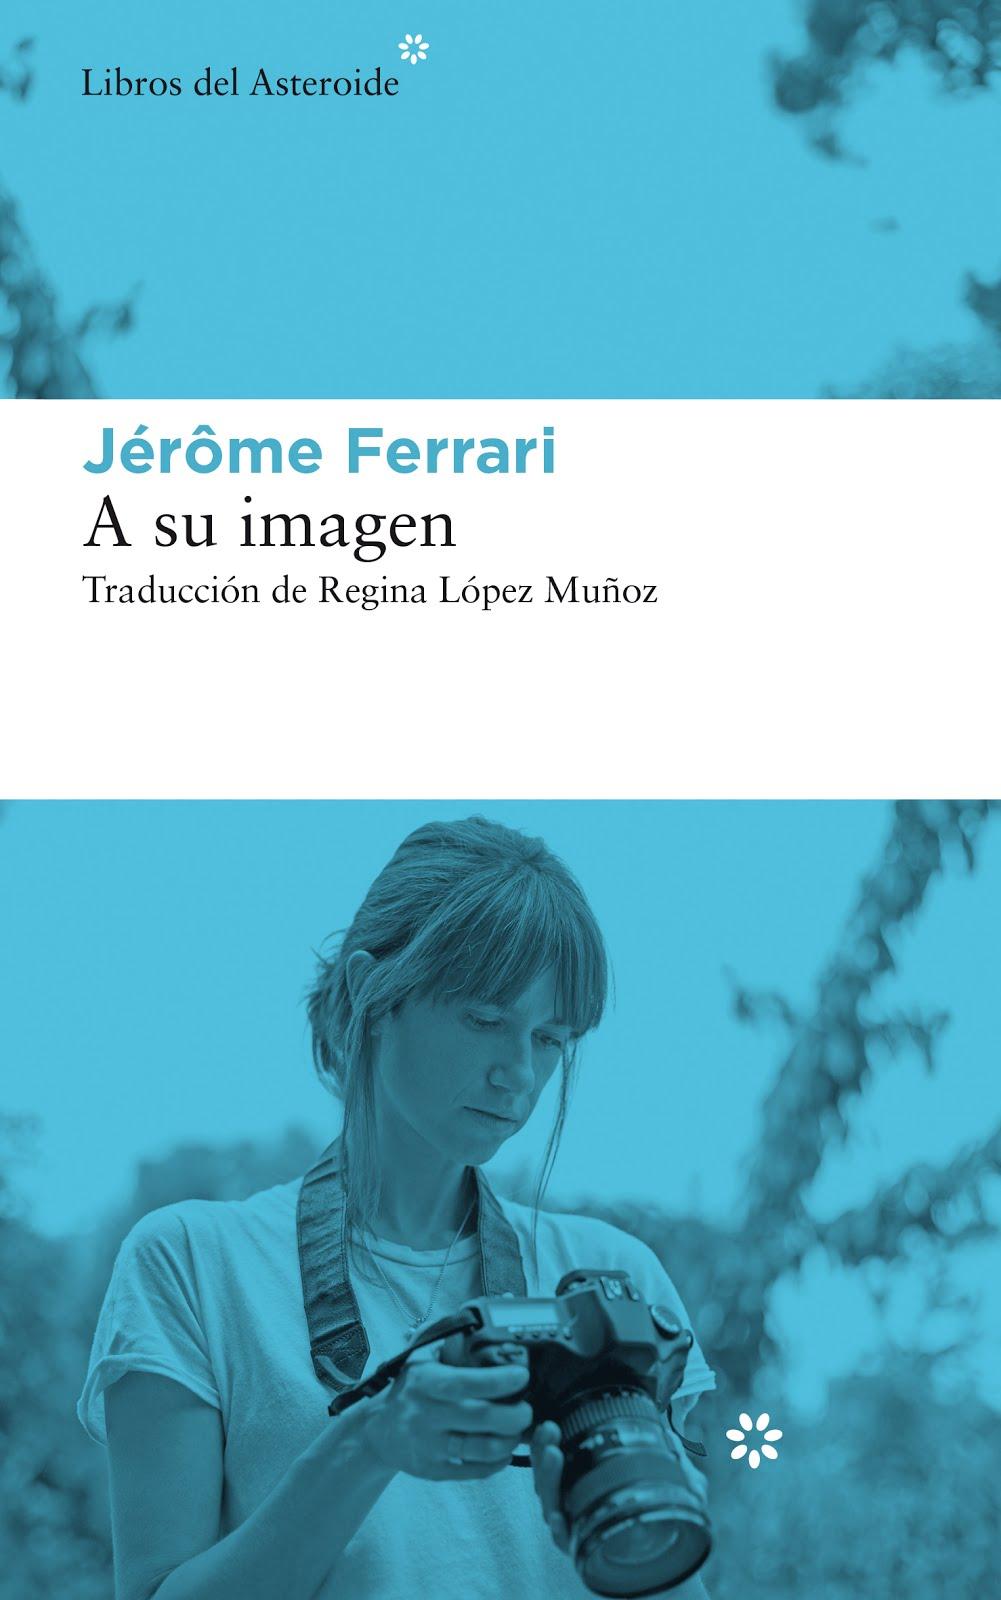 A su imagen, de Jérôme Ferrari.